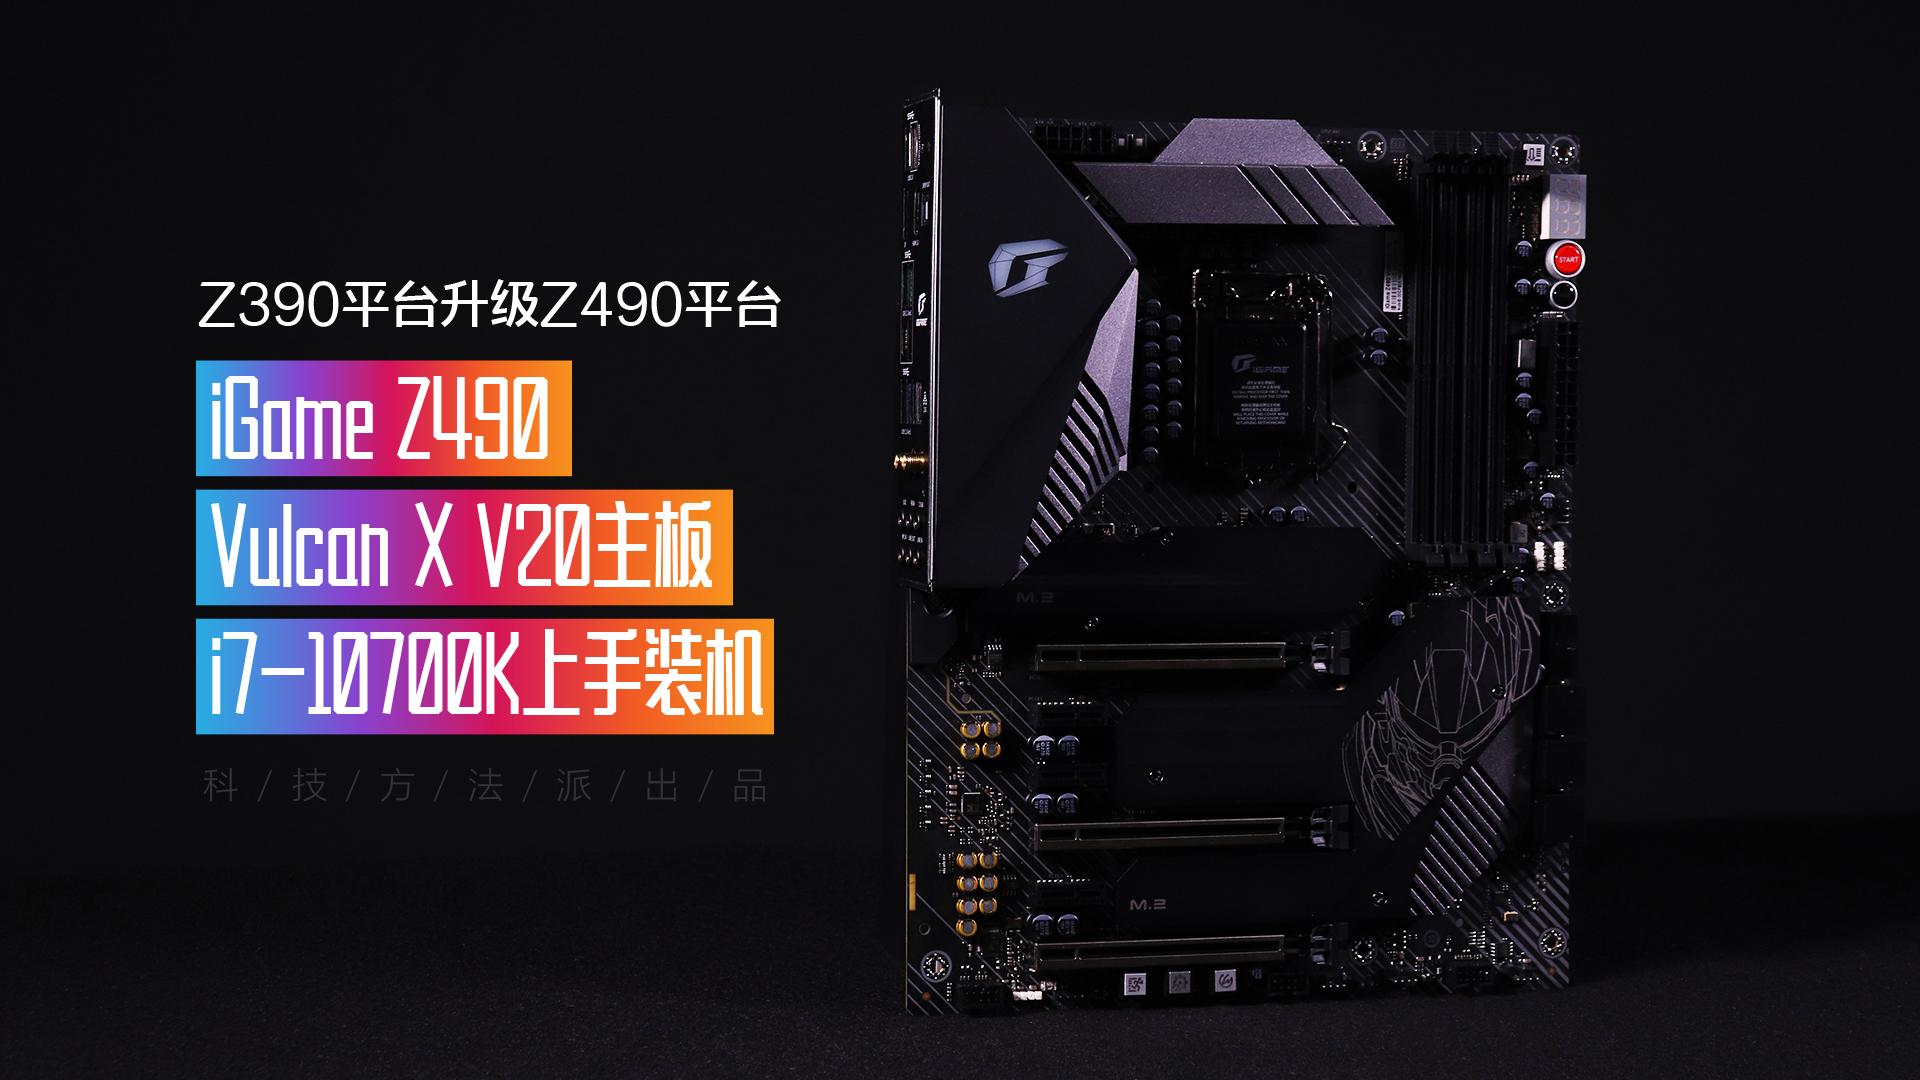 Z390平台升级Z490平台 七彩虹iGame Z490 Vulcan X V20主板+i7-107